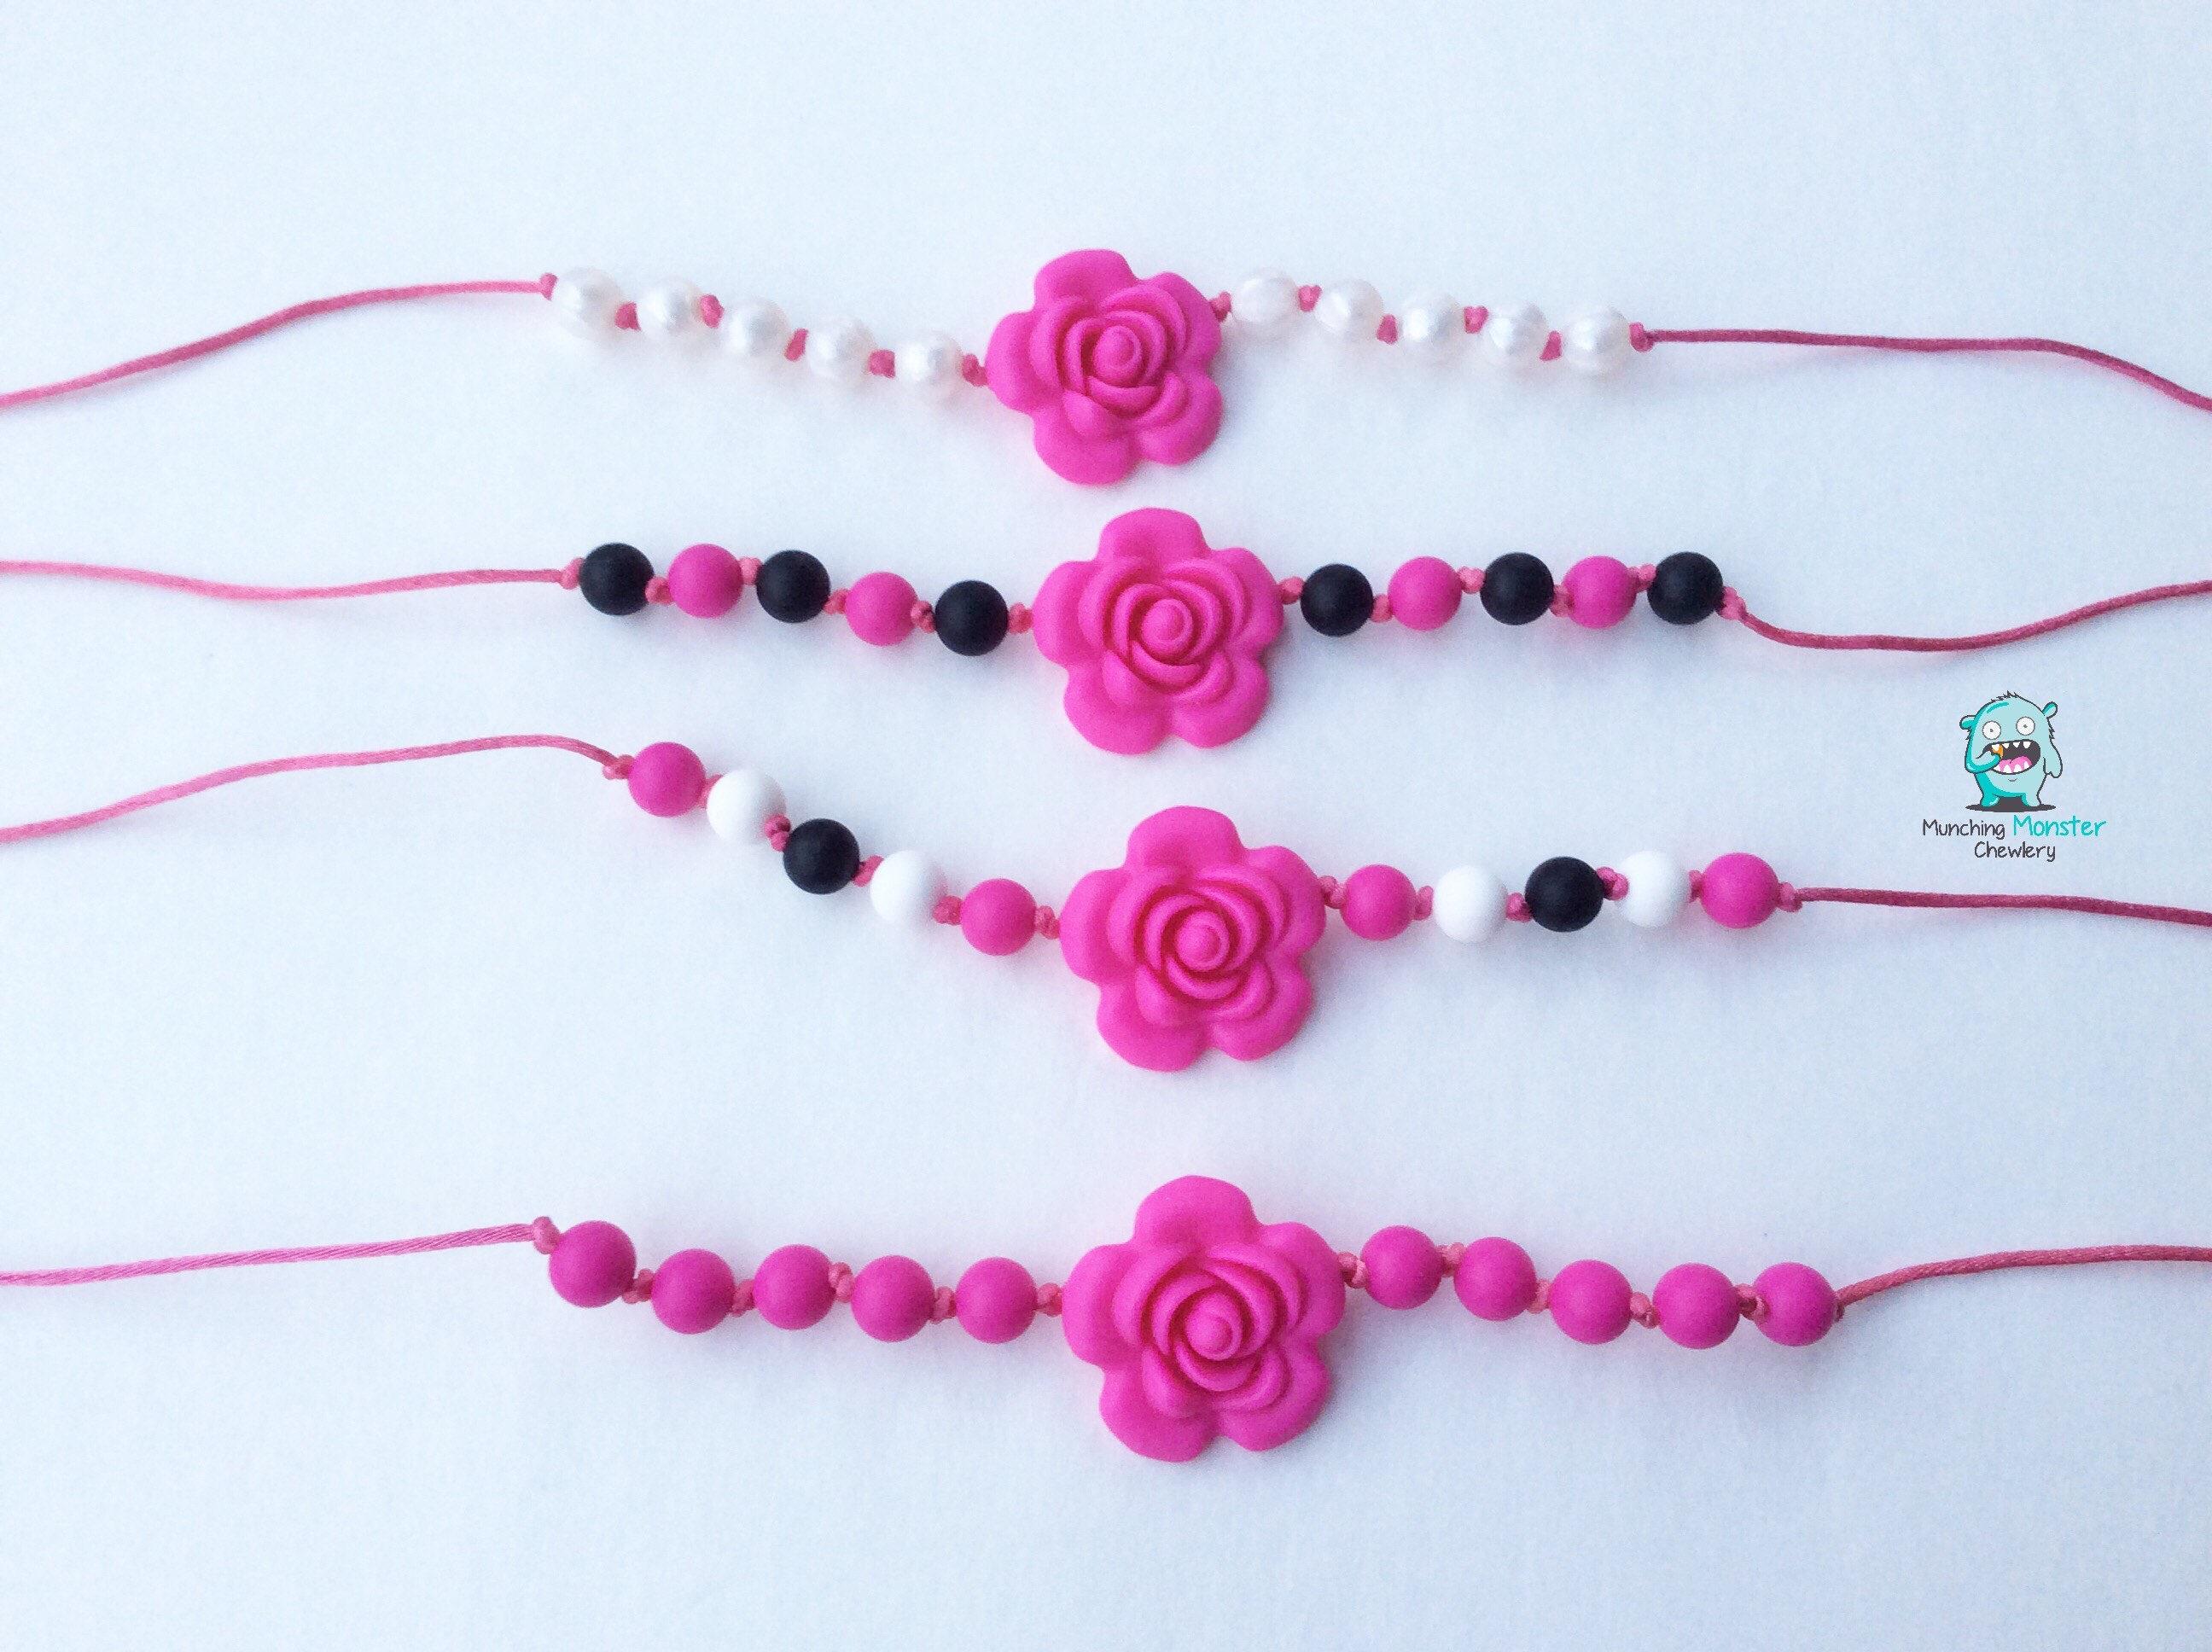 Rose Child s Necklace chewable necklace sensory necklace ASD